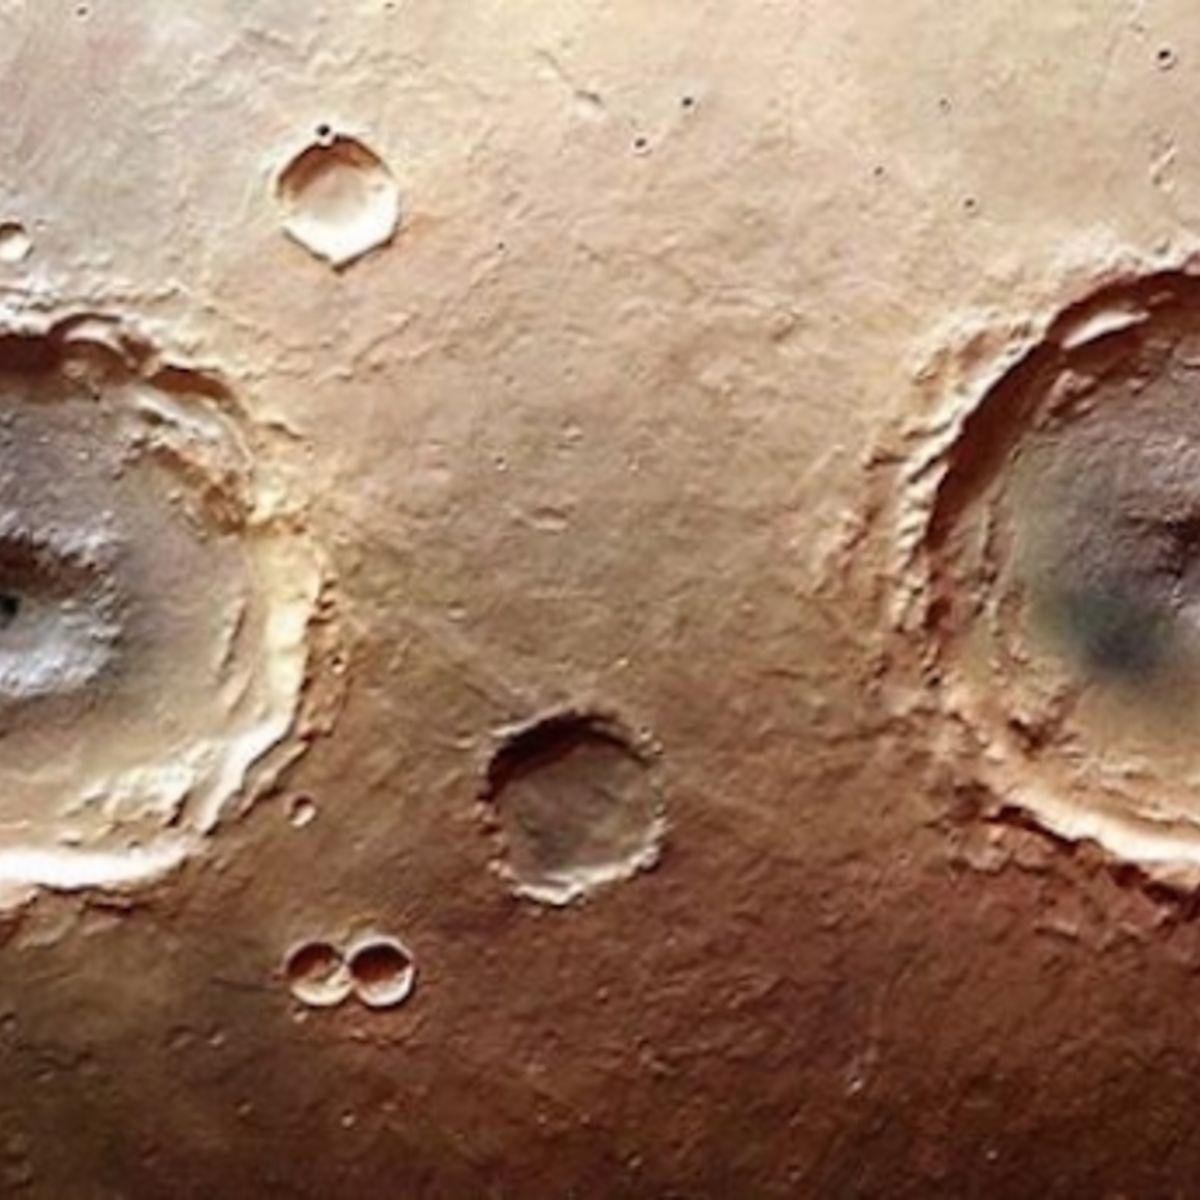 craters-on-mars.jpg